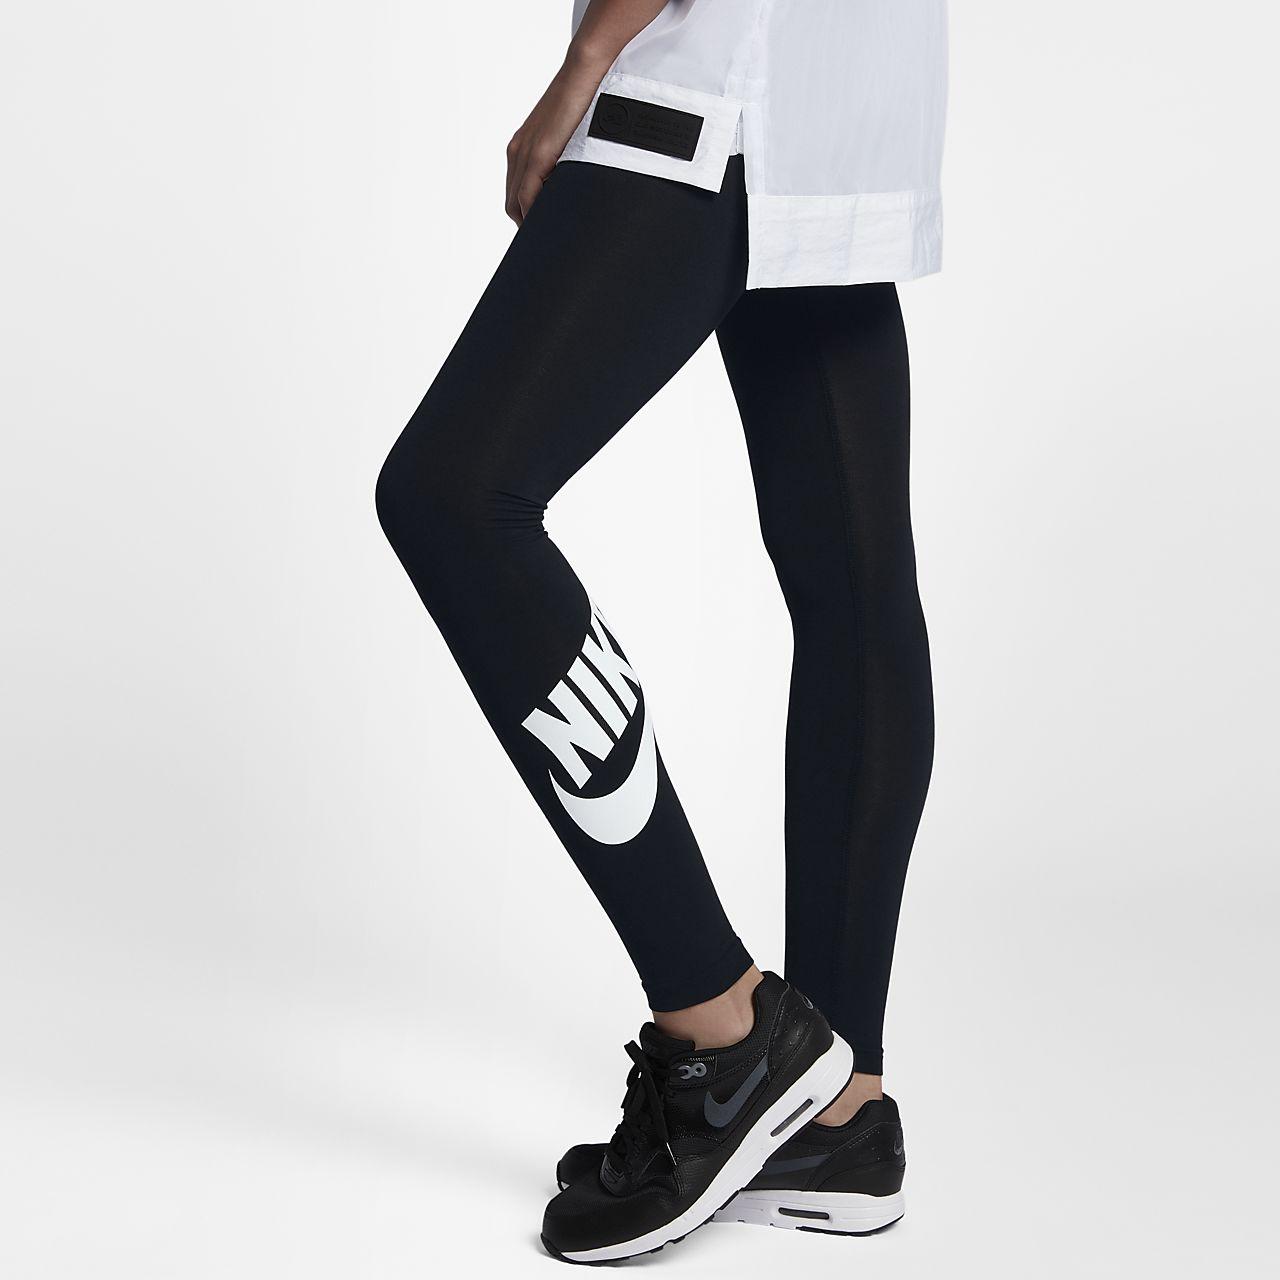 nike leggings logo